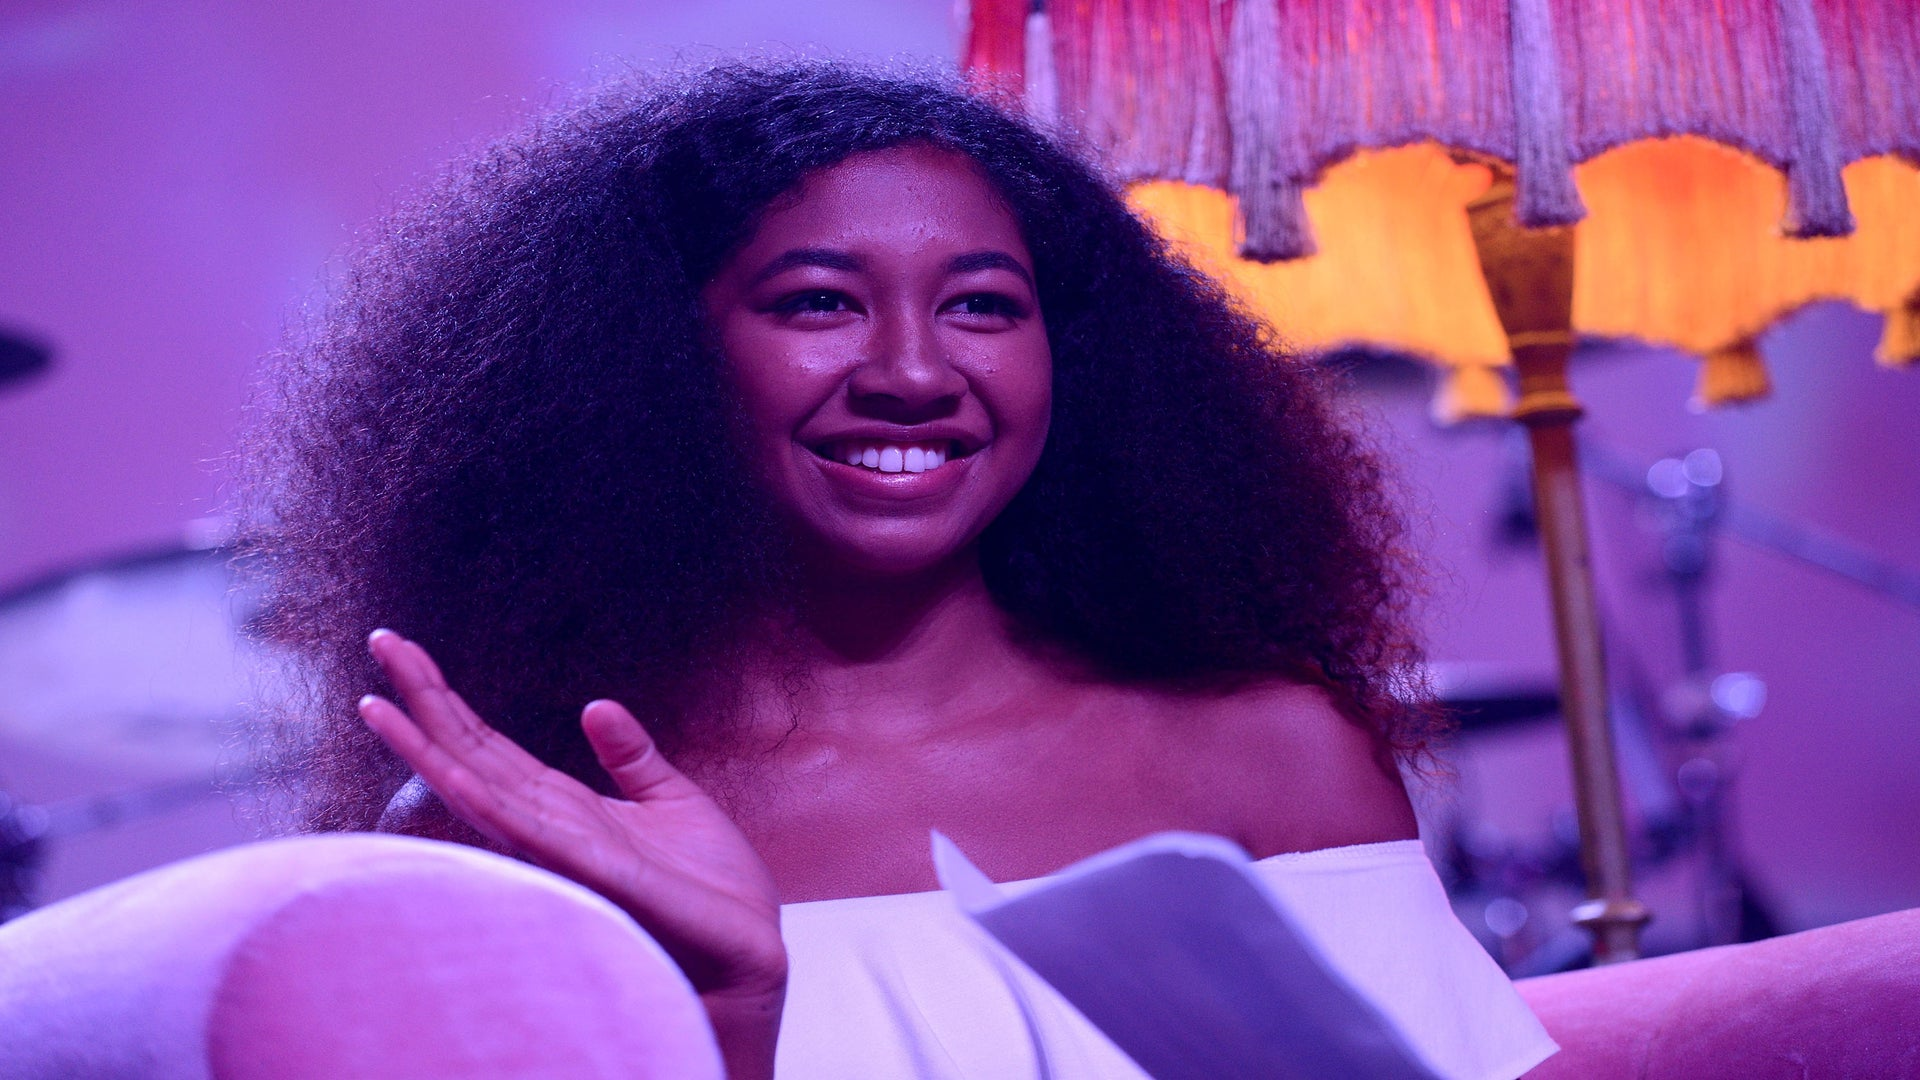 16-Year-Old Aoki Simmons Celebrates Getting Into Harvard University